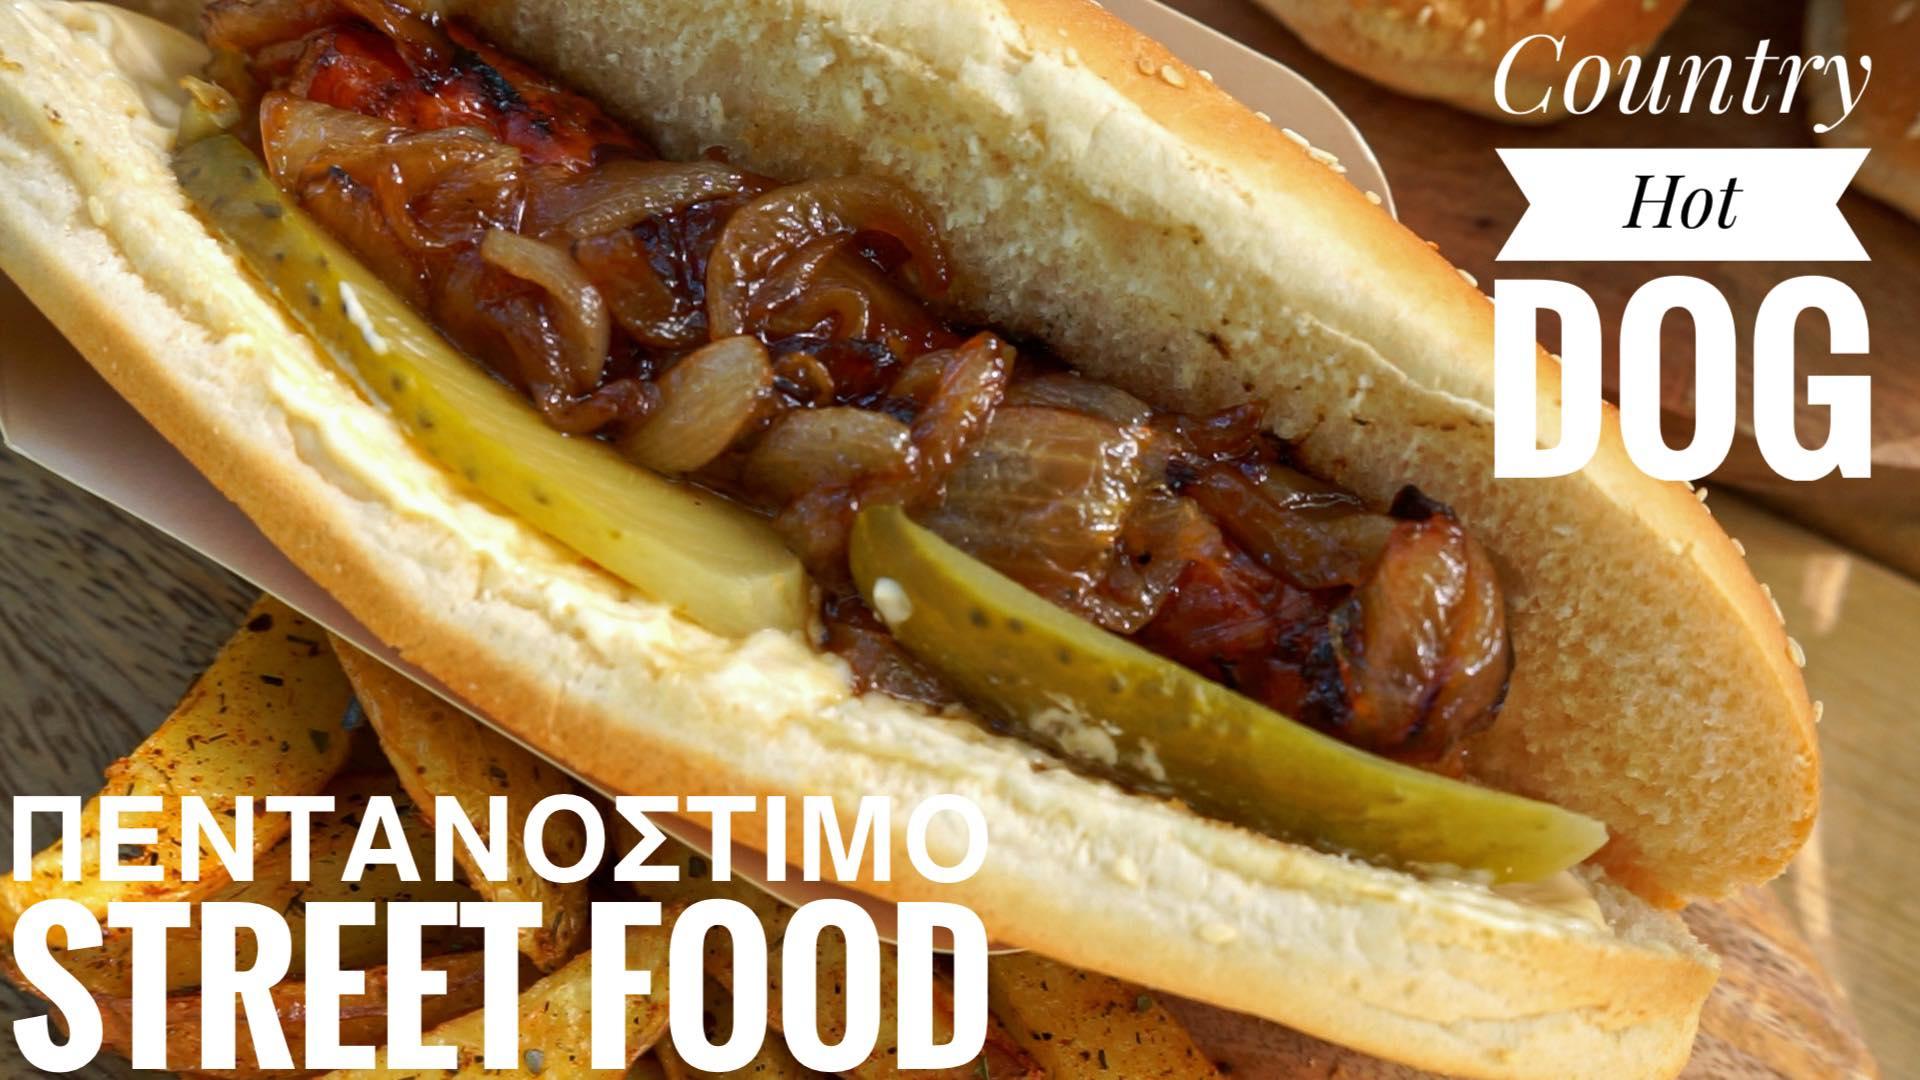 Country Hot Dog_με_καραμελωμένα κρεμμύδια_